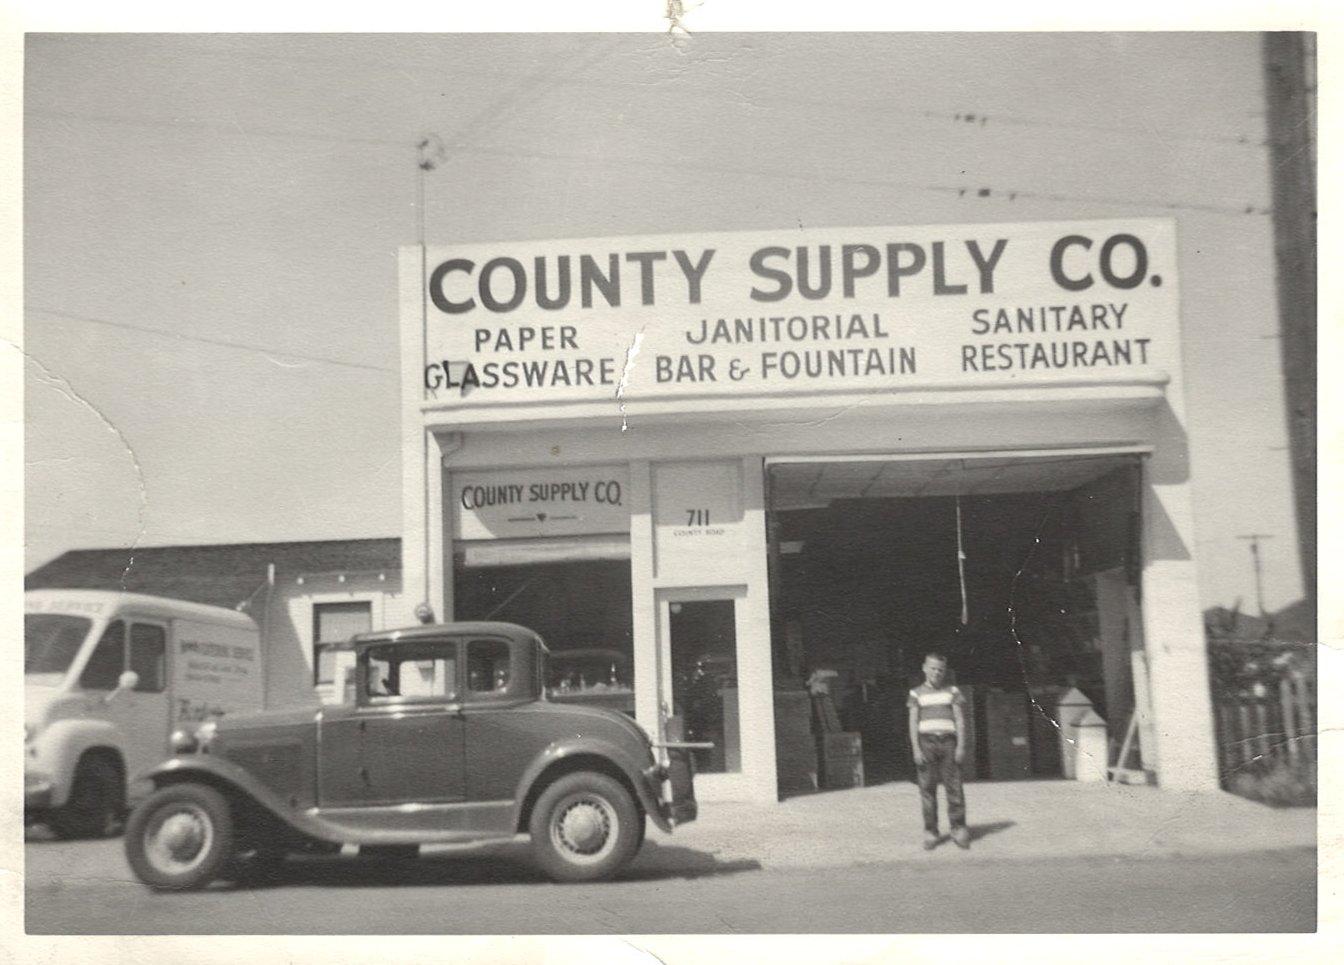 Original CRS Building